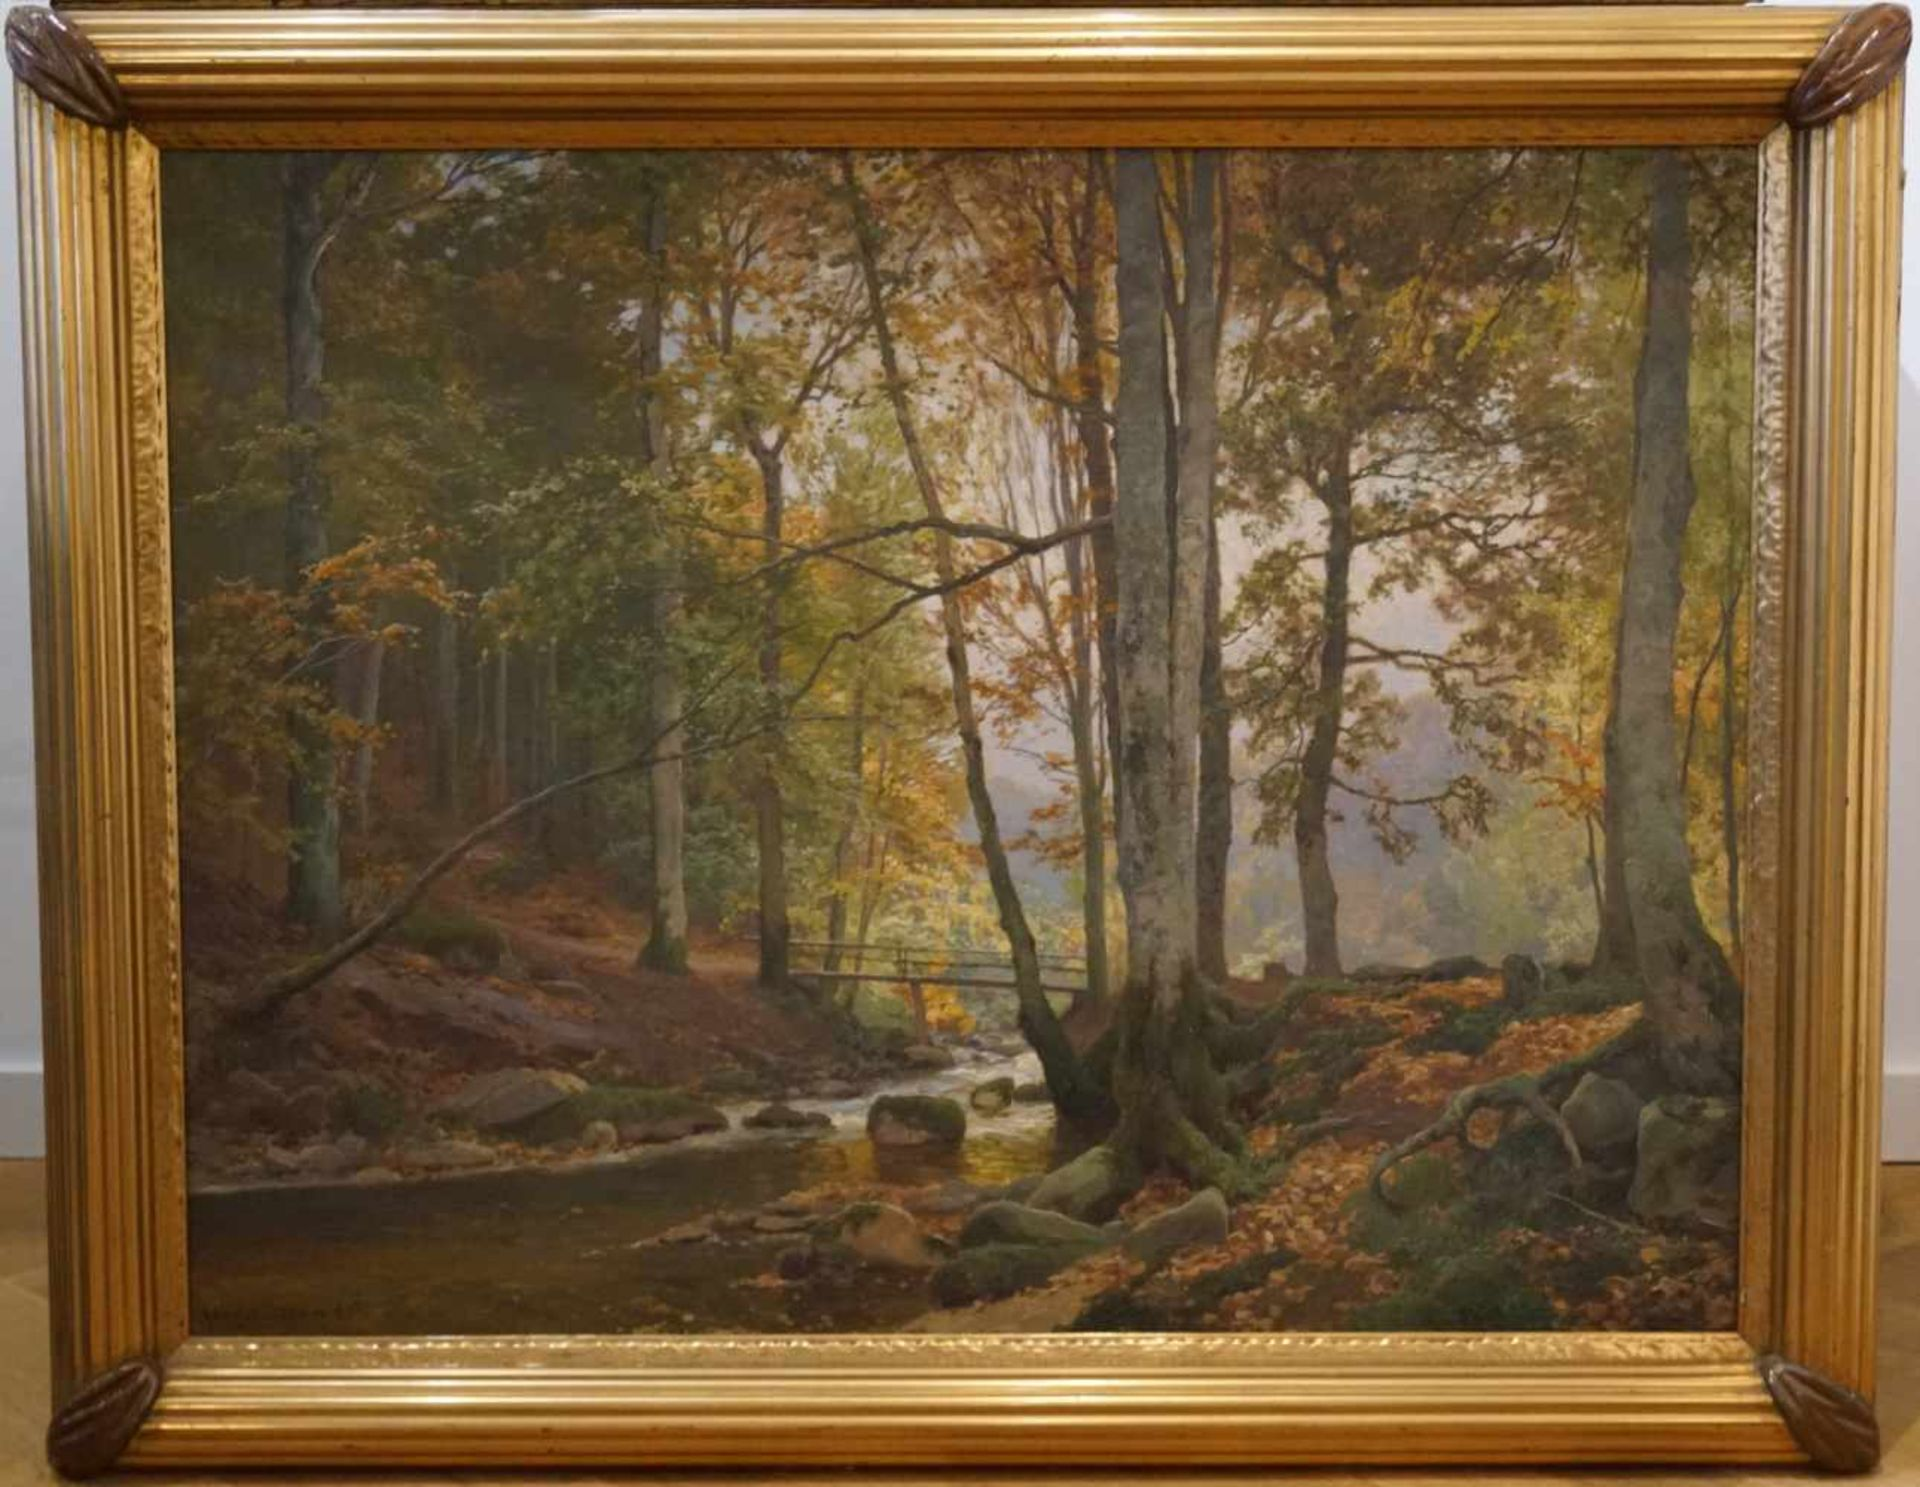 Sonnendurchflutetes Waldstück Heinrich Böhmer der Ältere (1852-1930), Öl/Leinwand, unten links